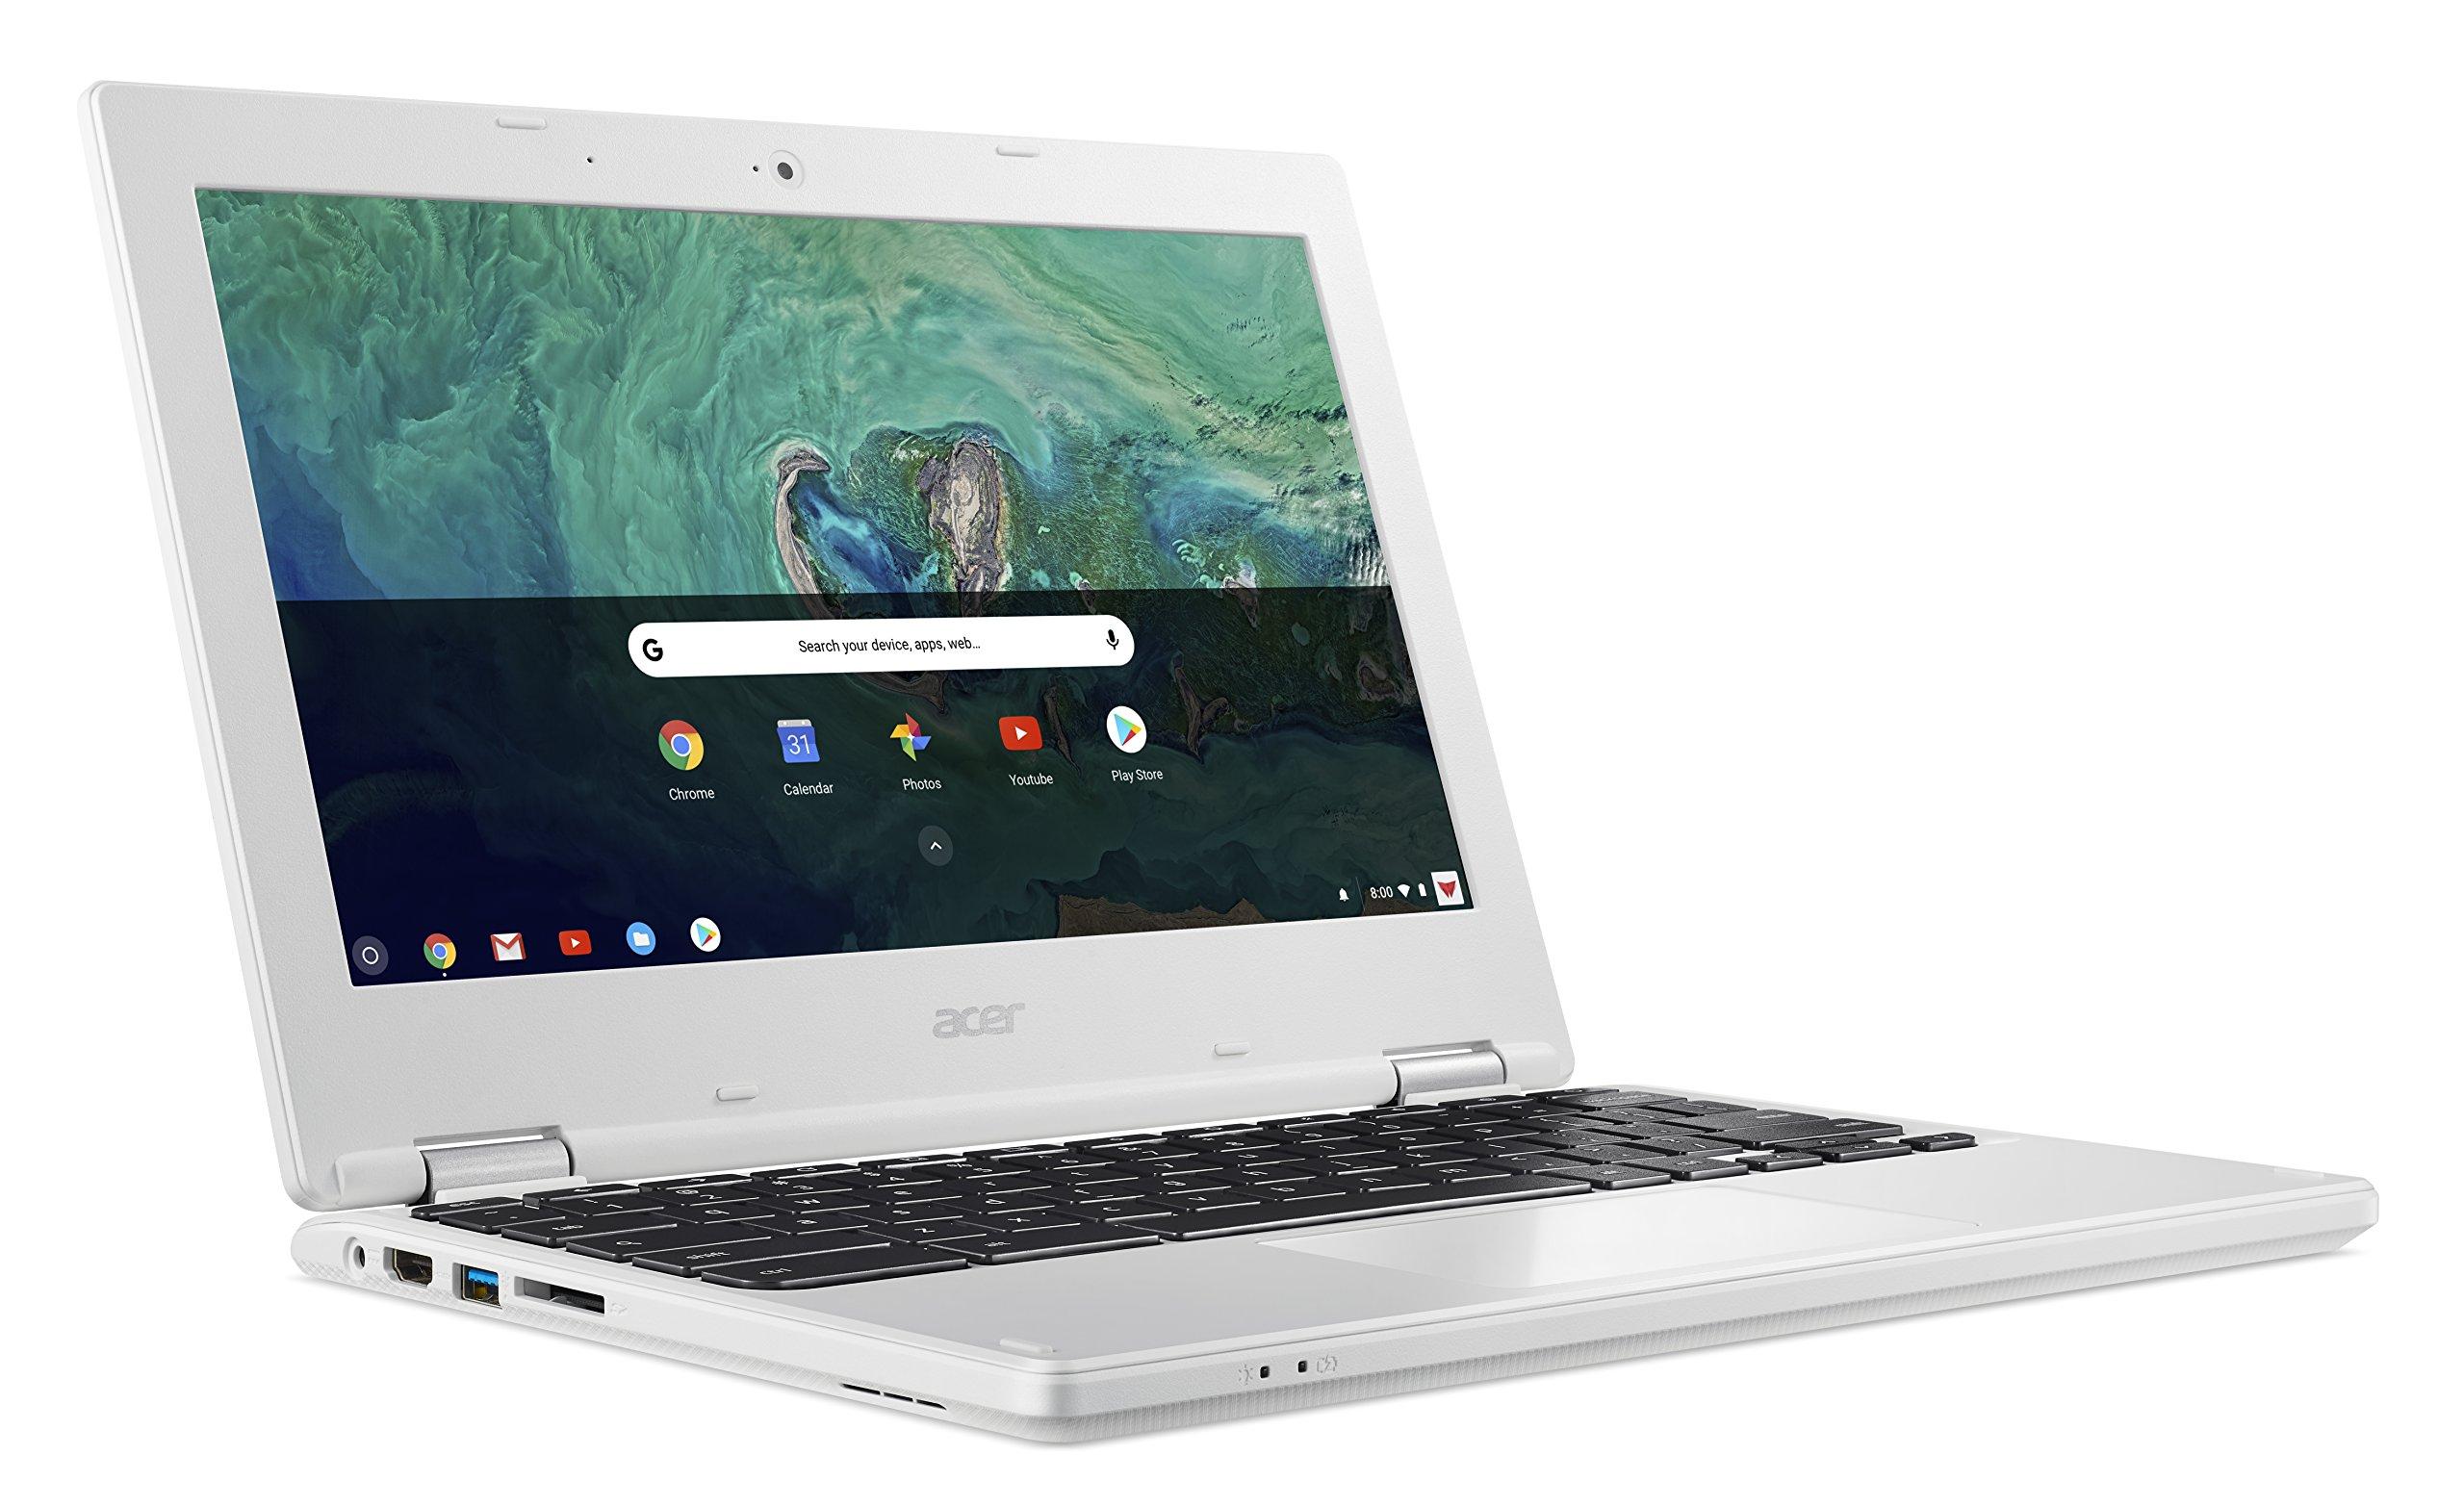 Acer-Chromebook-11-CB3-132-Intel-Atom-x5-E8000-2GB-RAM-16GB-eMMC-116-inch-HD-Display-Google-Chrome-OS-White